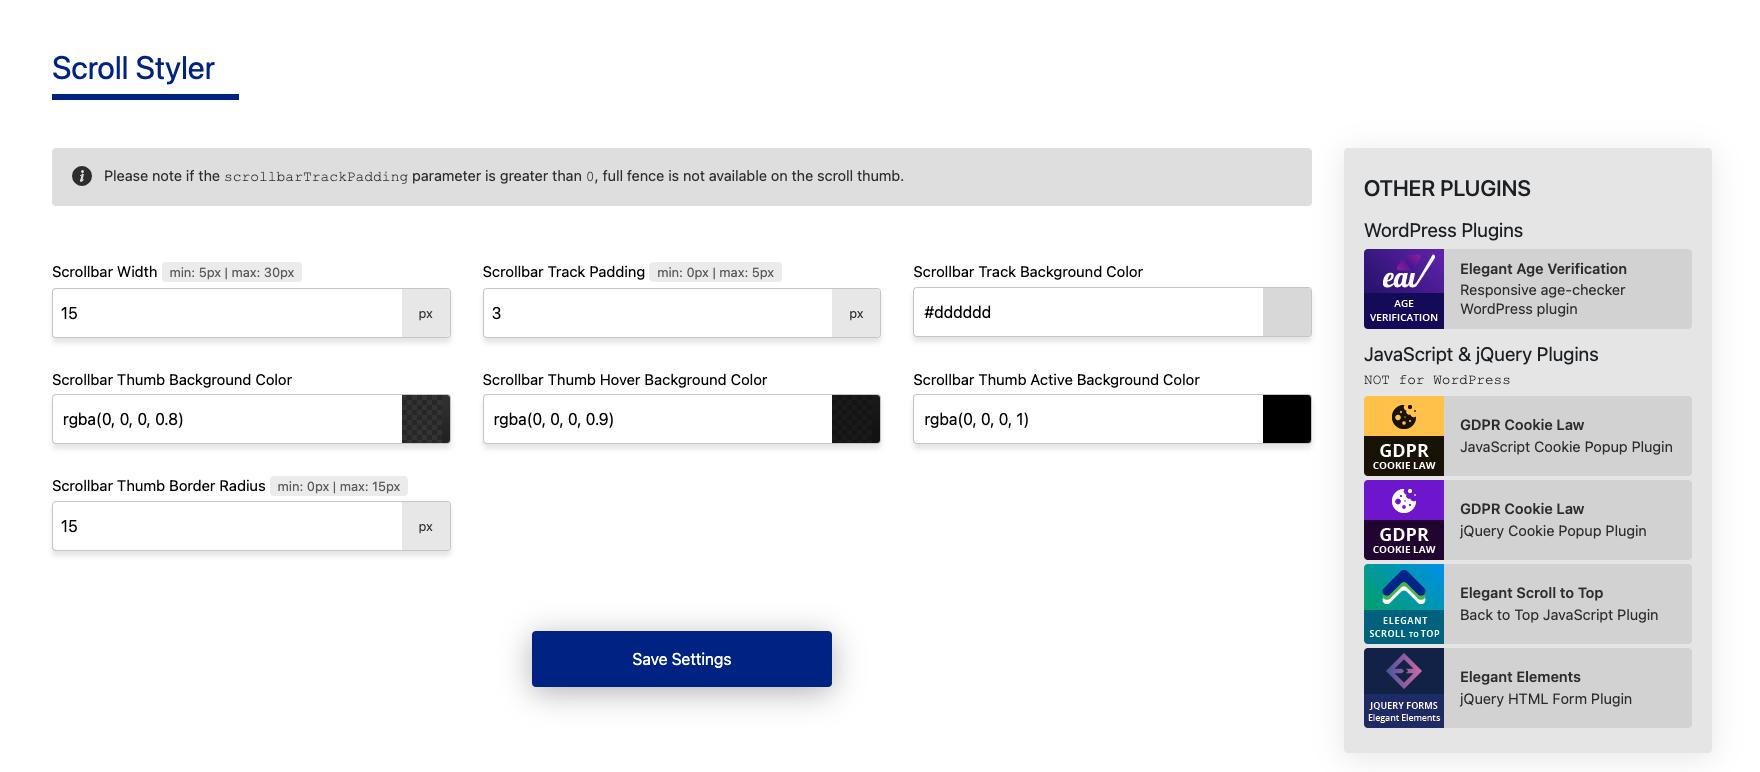 Admin Customization Options